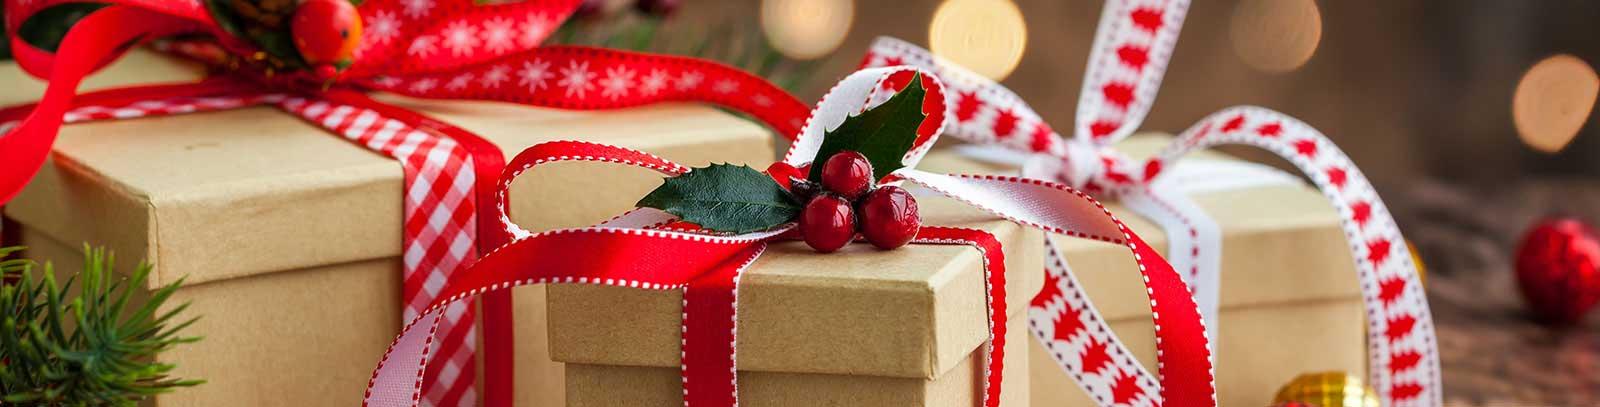 Enjoy Holiday Events in Riviera Nayarit